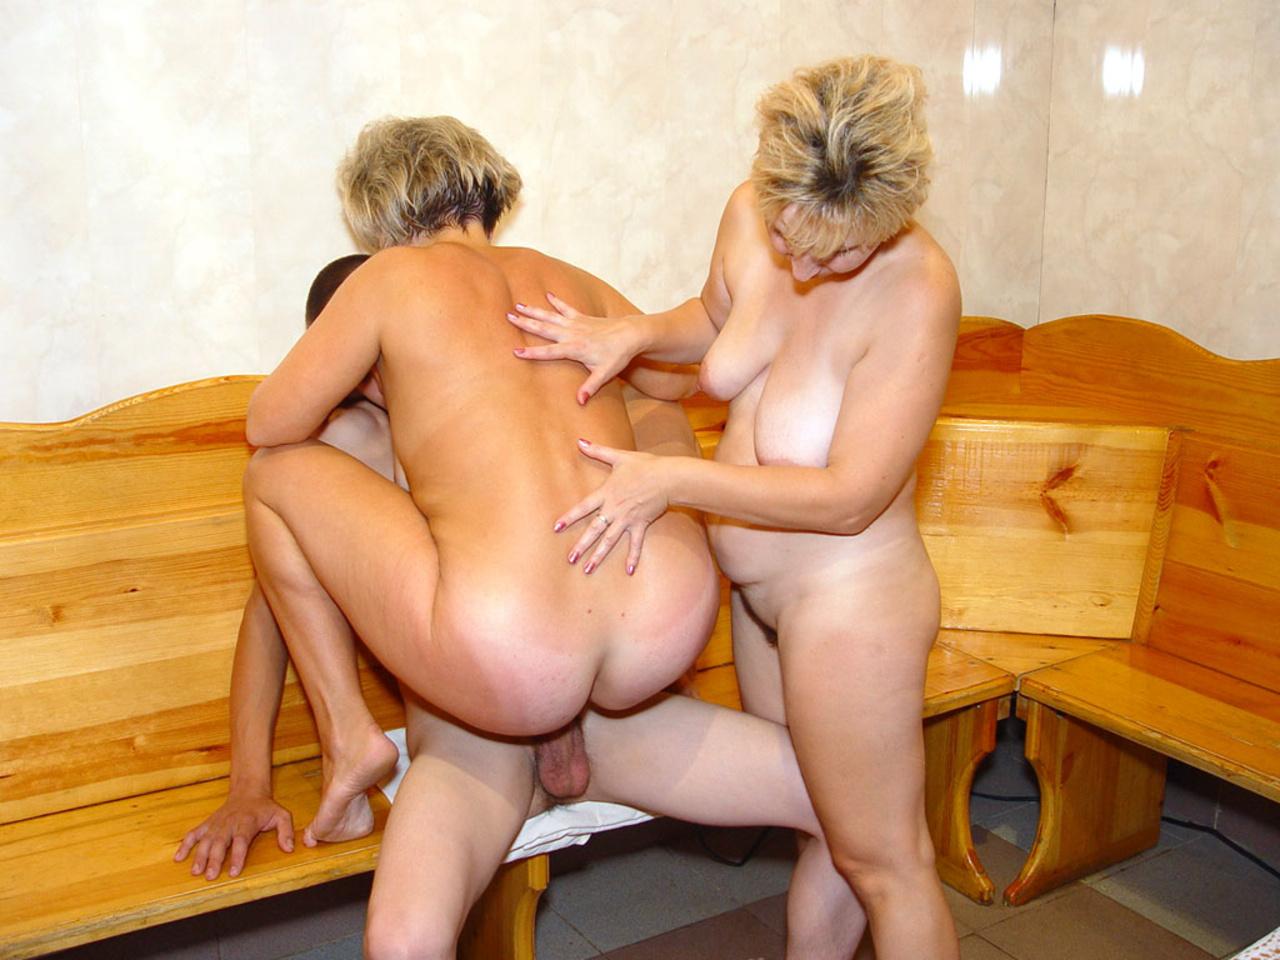 Секс с тещей в бане деревенской, Порно в бане с тещей смотреть онлайн видео Мамаши 9 фотография